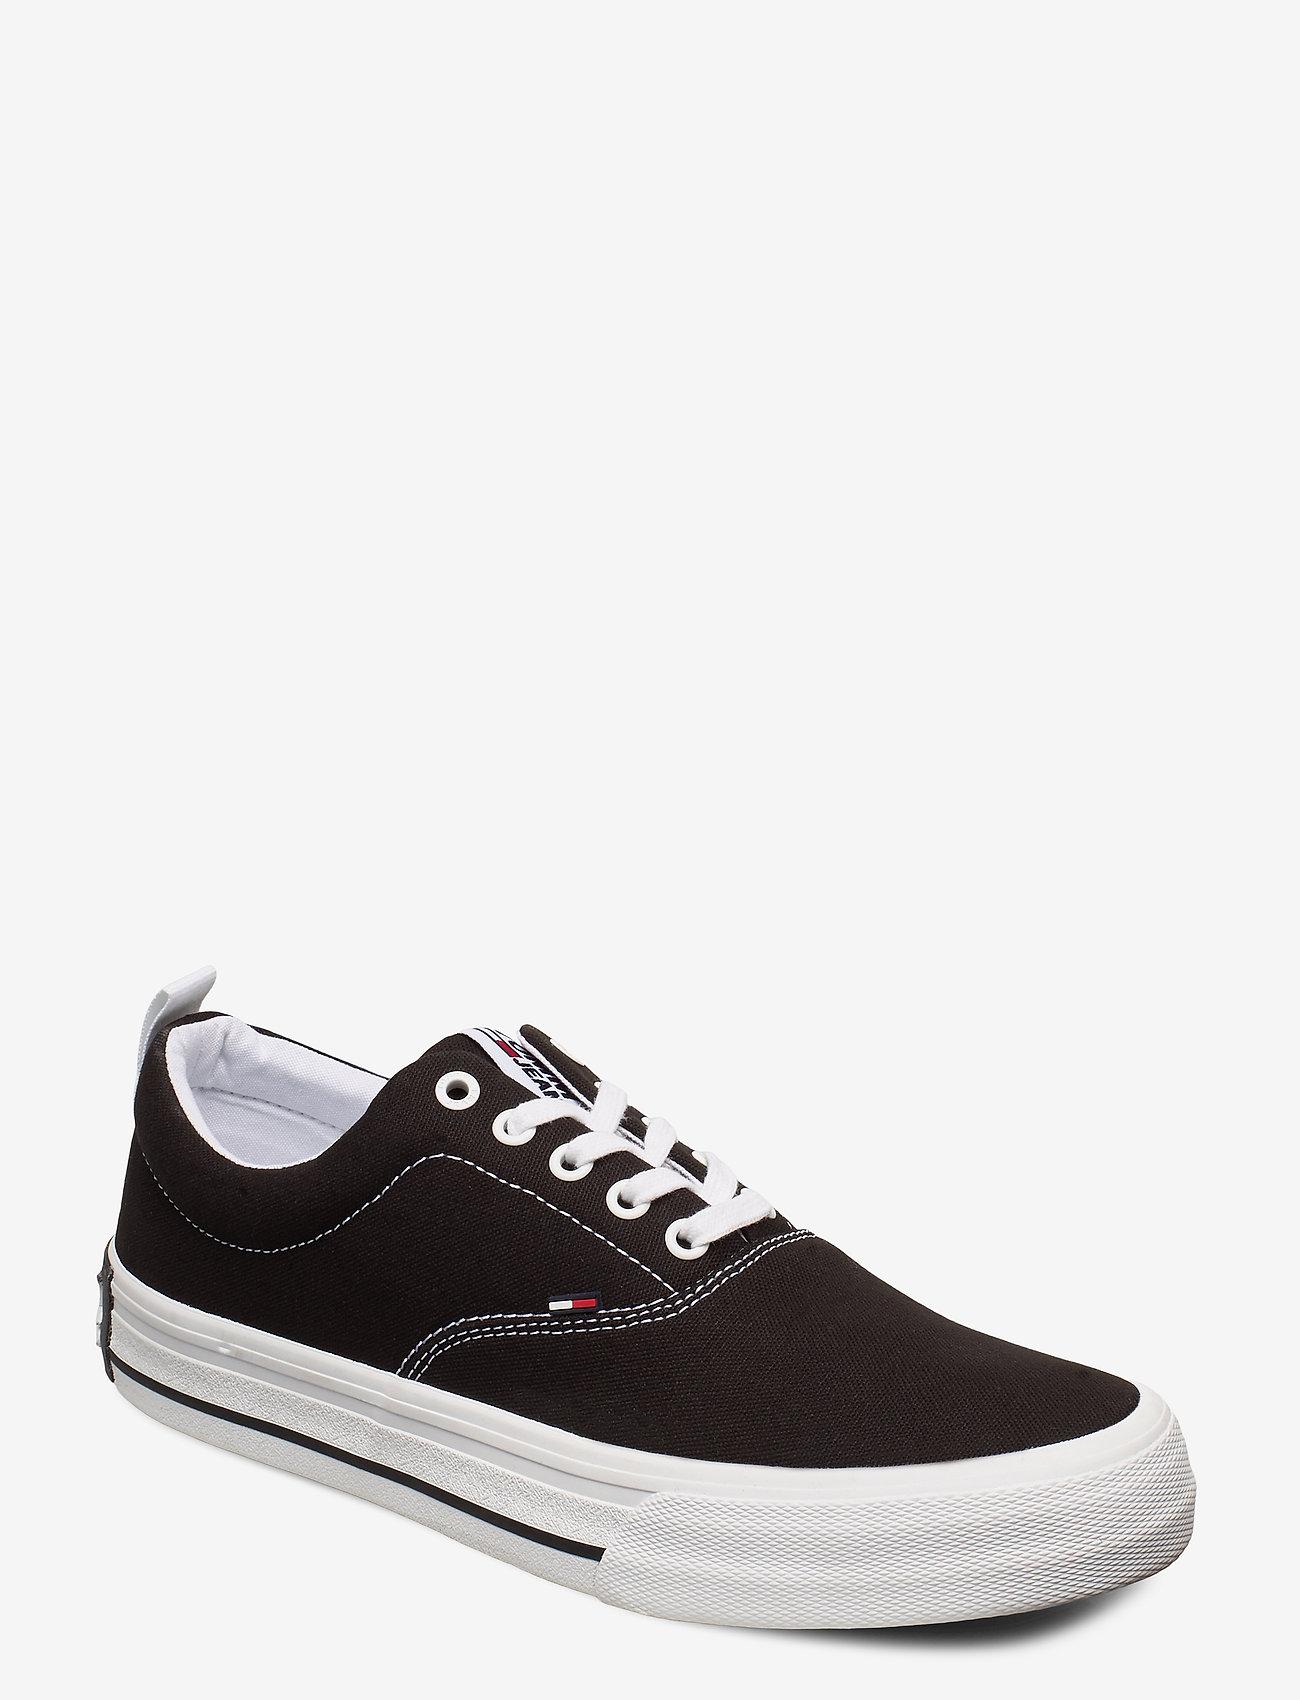 Classic Low Tommy Jeans Sneaker (Black